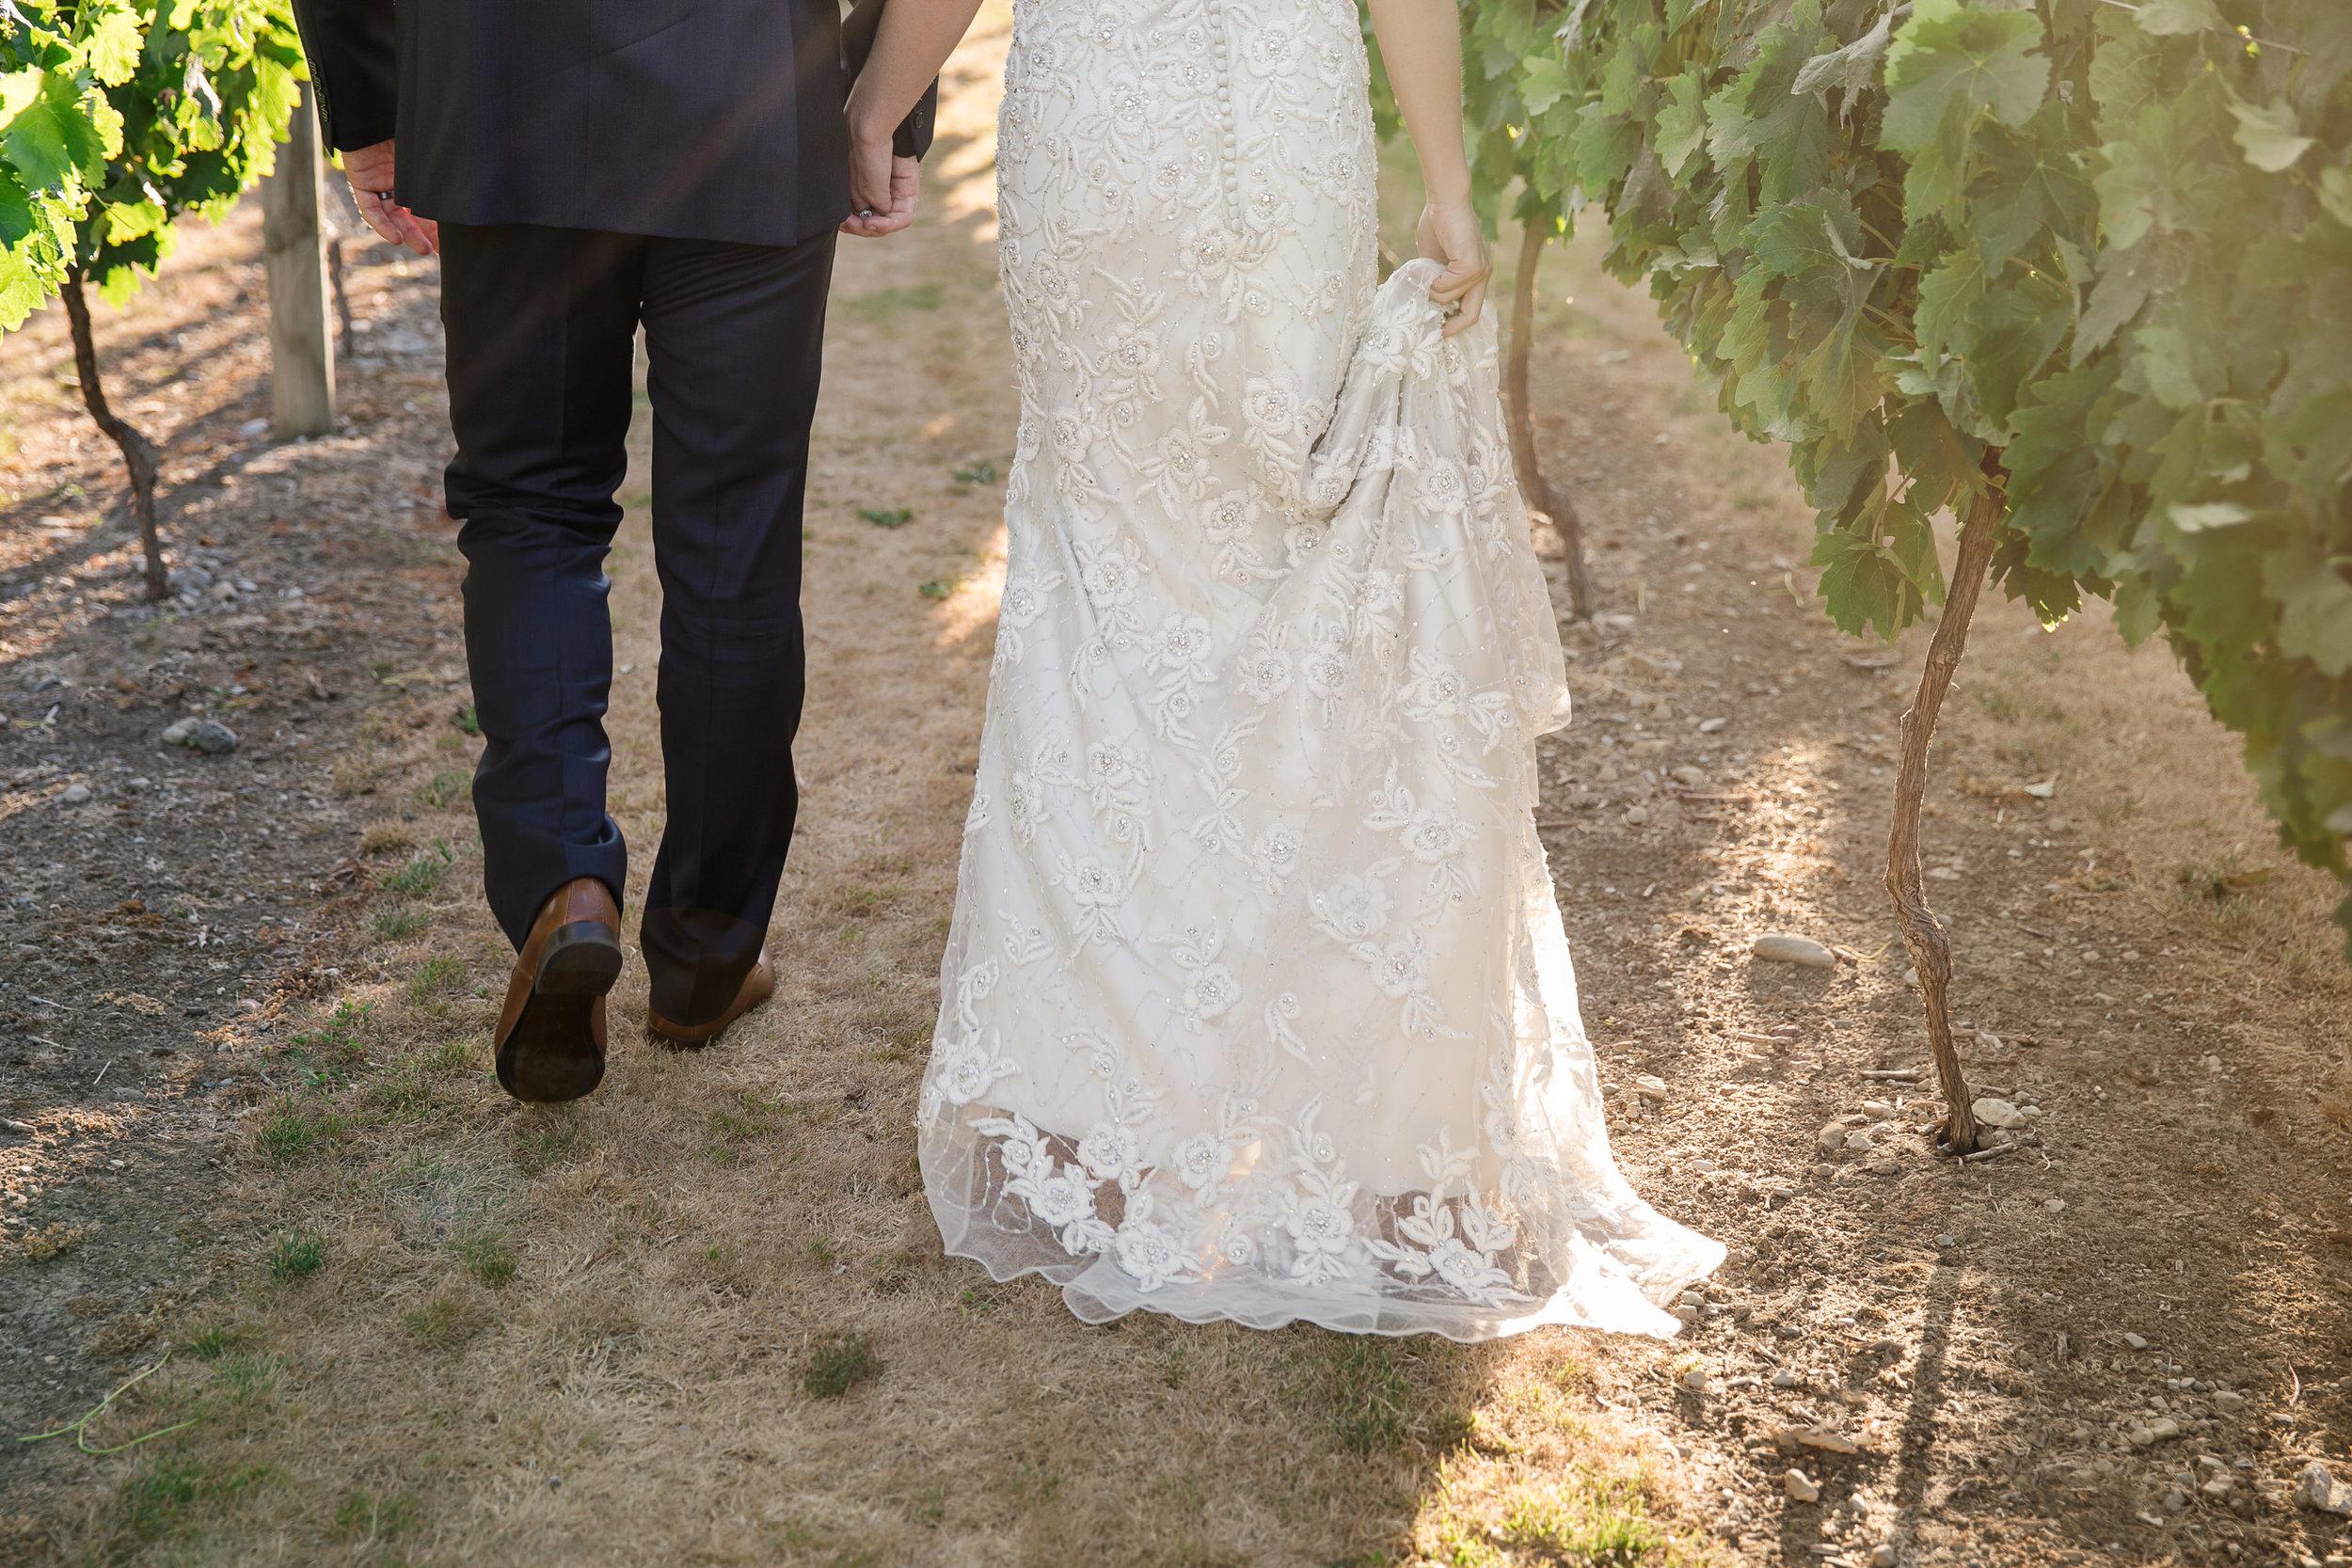 Martinborough-Poppies-Wedding-Caine-Eloise-Toni-Larsen-0114.jpg